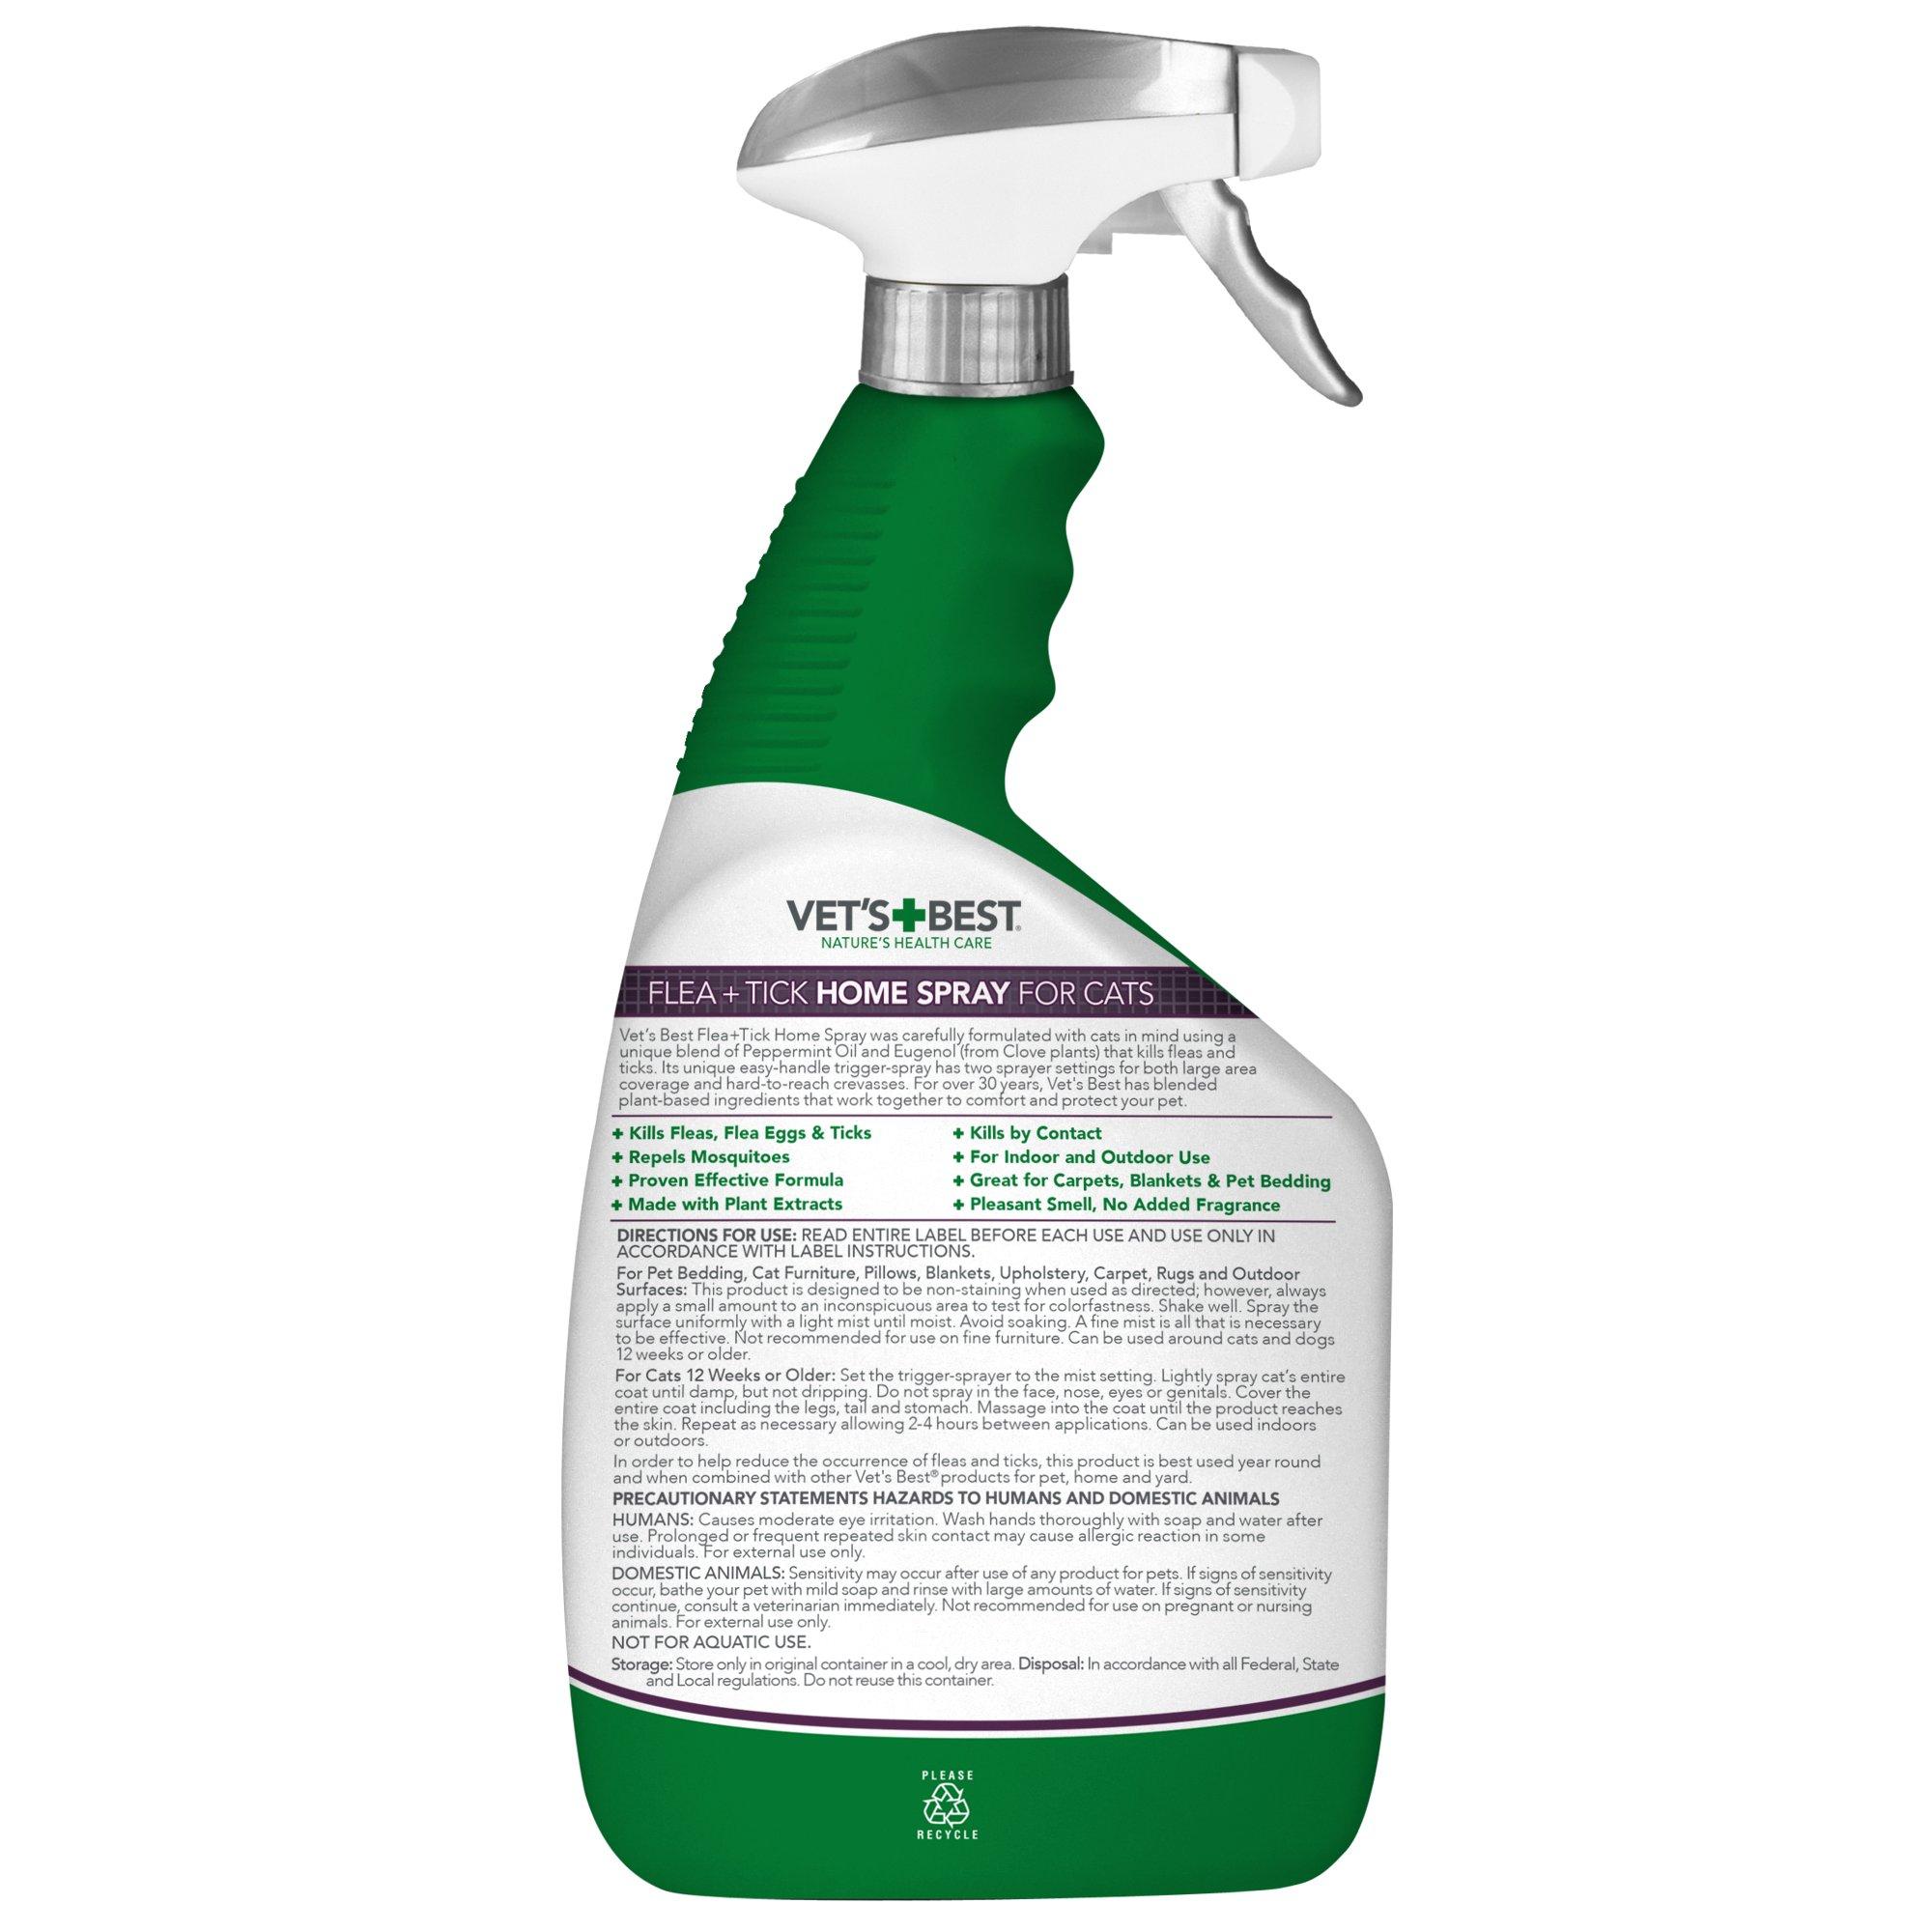 Vet's Best Flea & Tick Home Spray for Cats, 32 fl. oz., 32